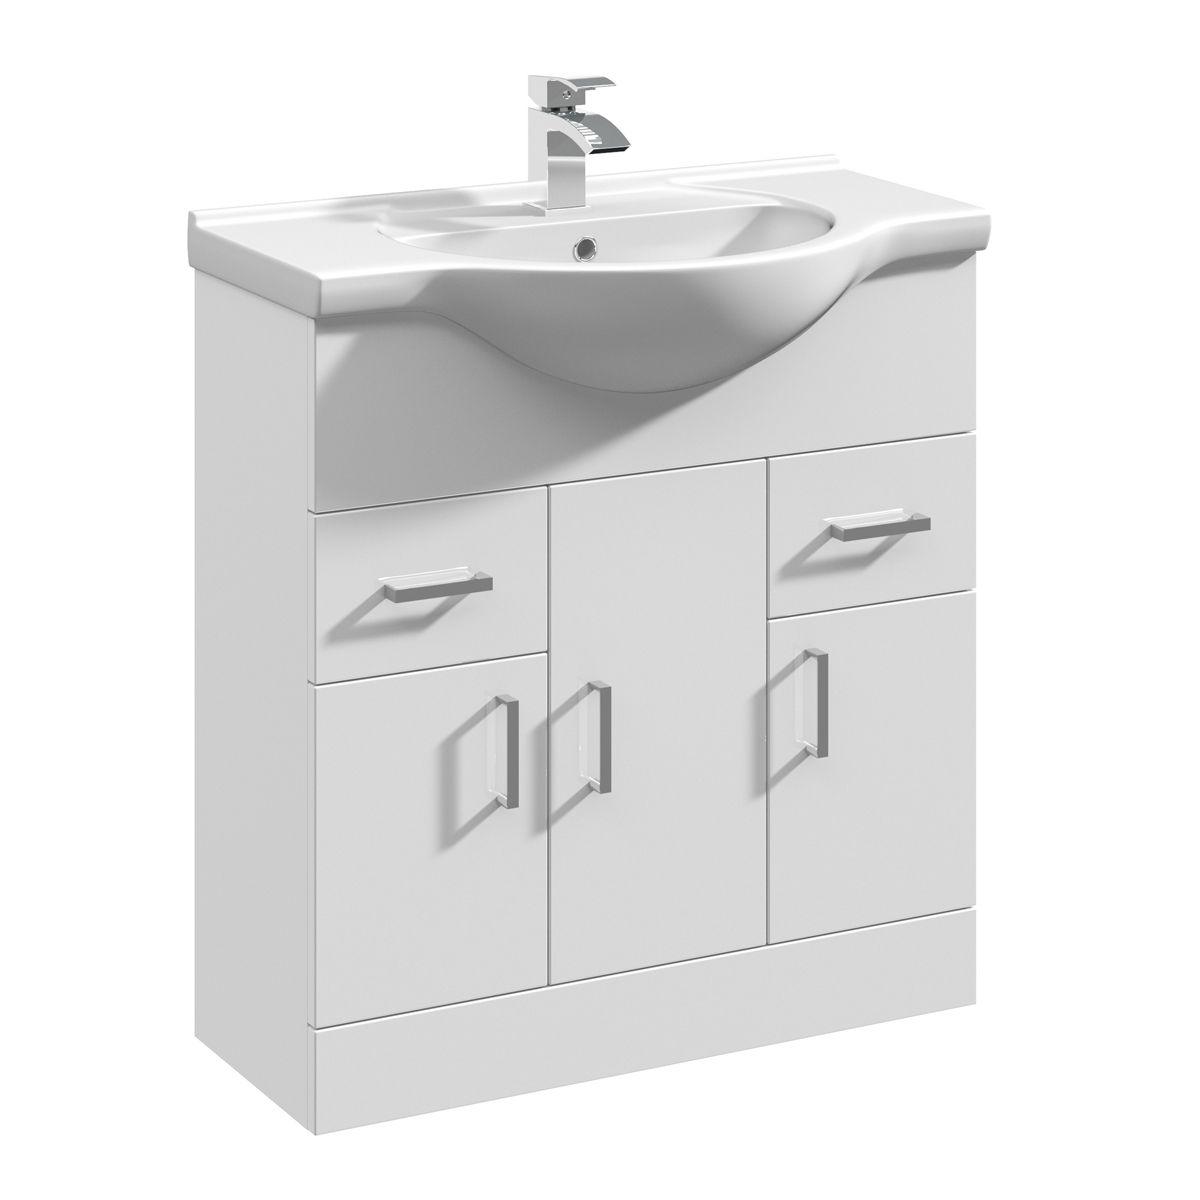 Nuie High Gloss White Vanity Unit 750mm